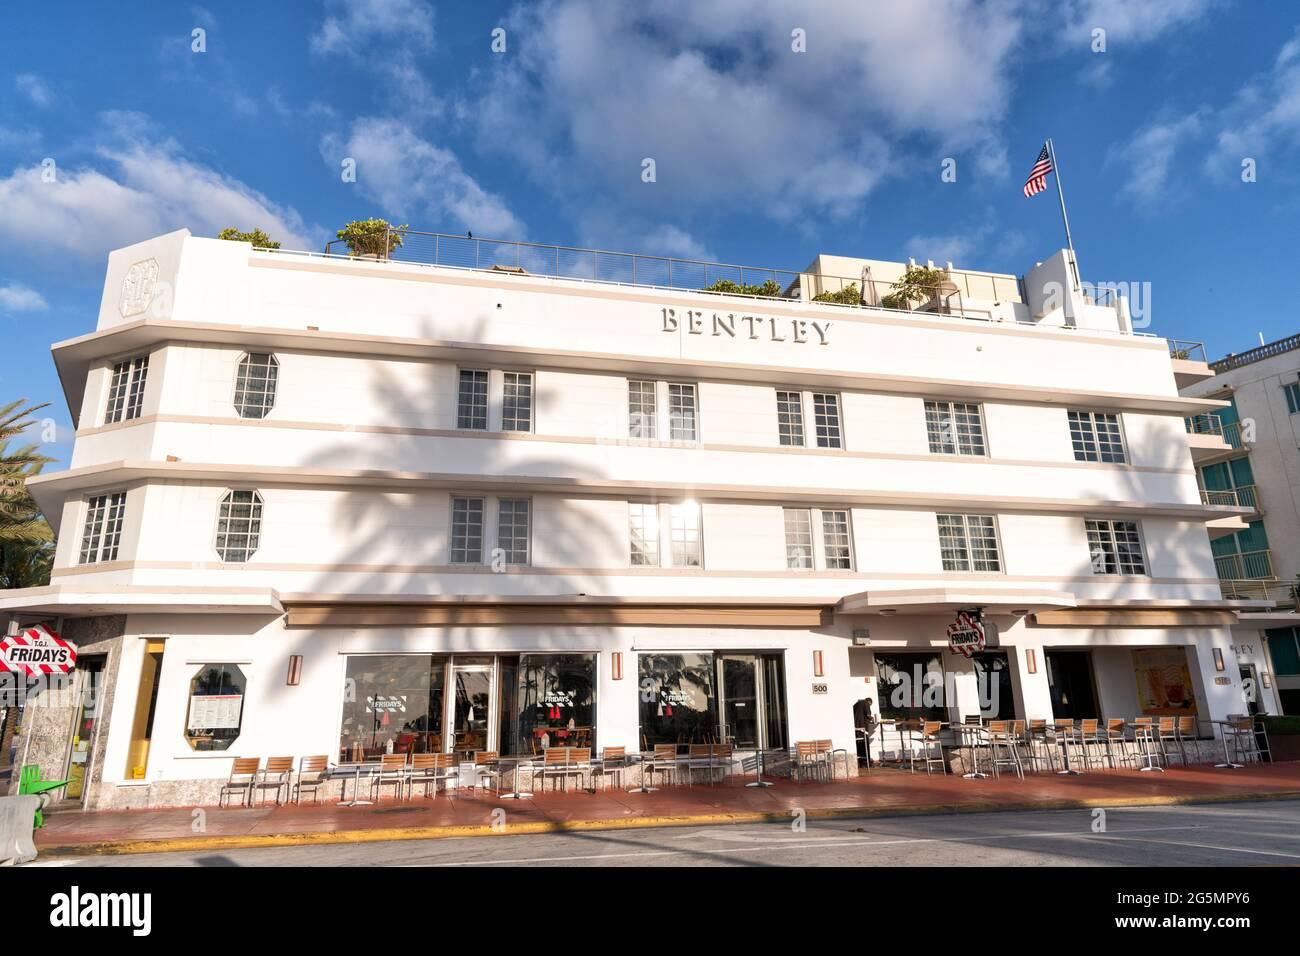 Miami, USA - April 15, 2021: Bentley hotel on Ocean Drive street in Florida Stock Photo